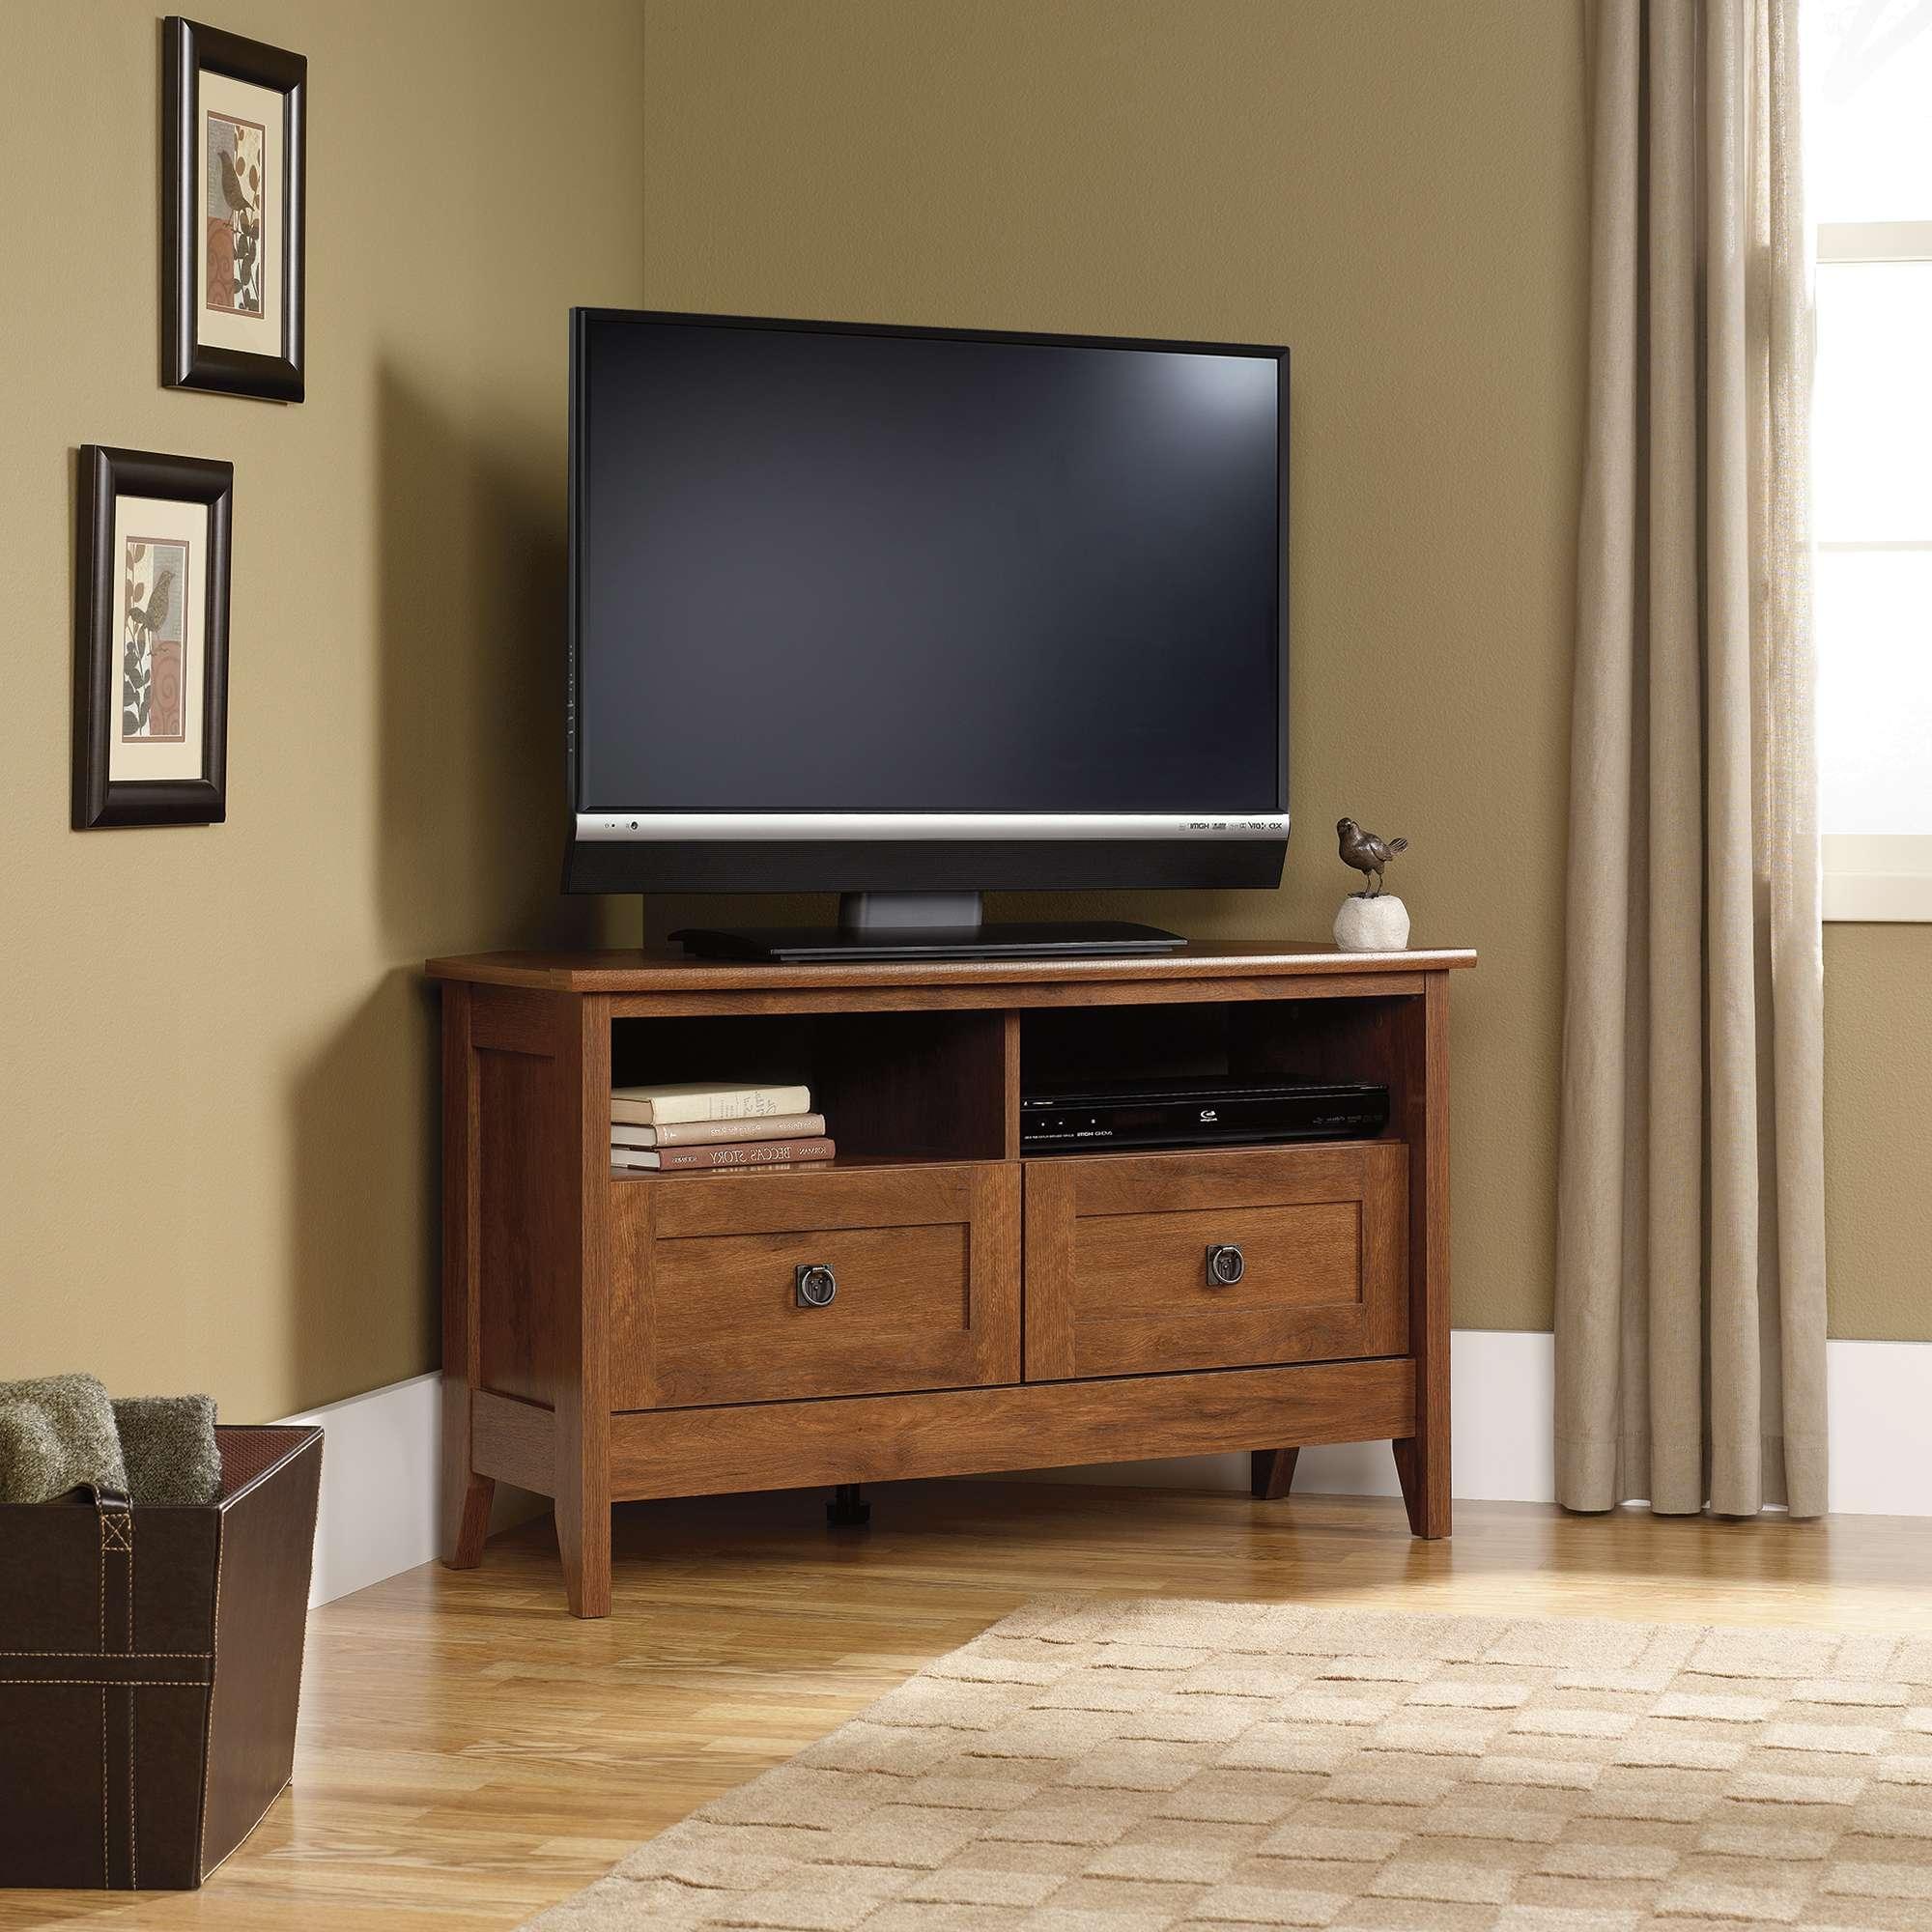 Sauder Select   Corner Tv Stand   410627   Sauder In Cornet Tv Stands (View 14 of 15)